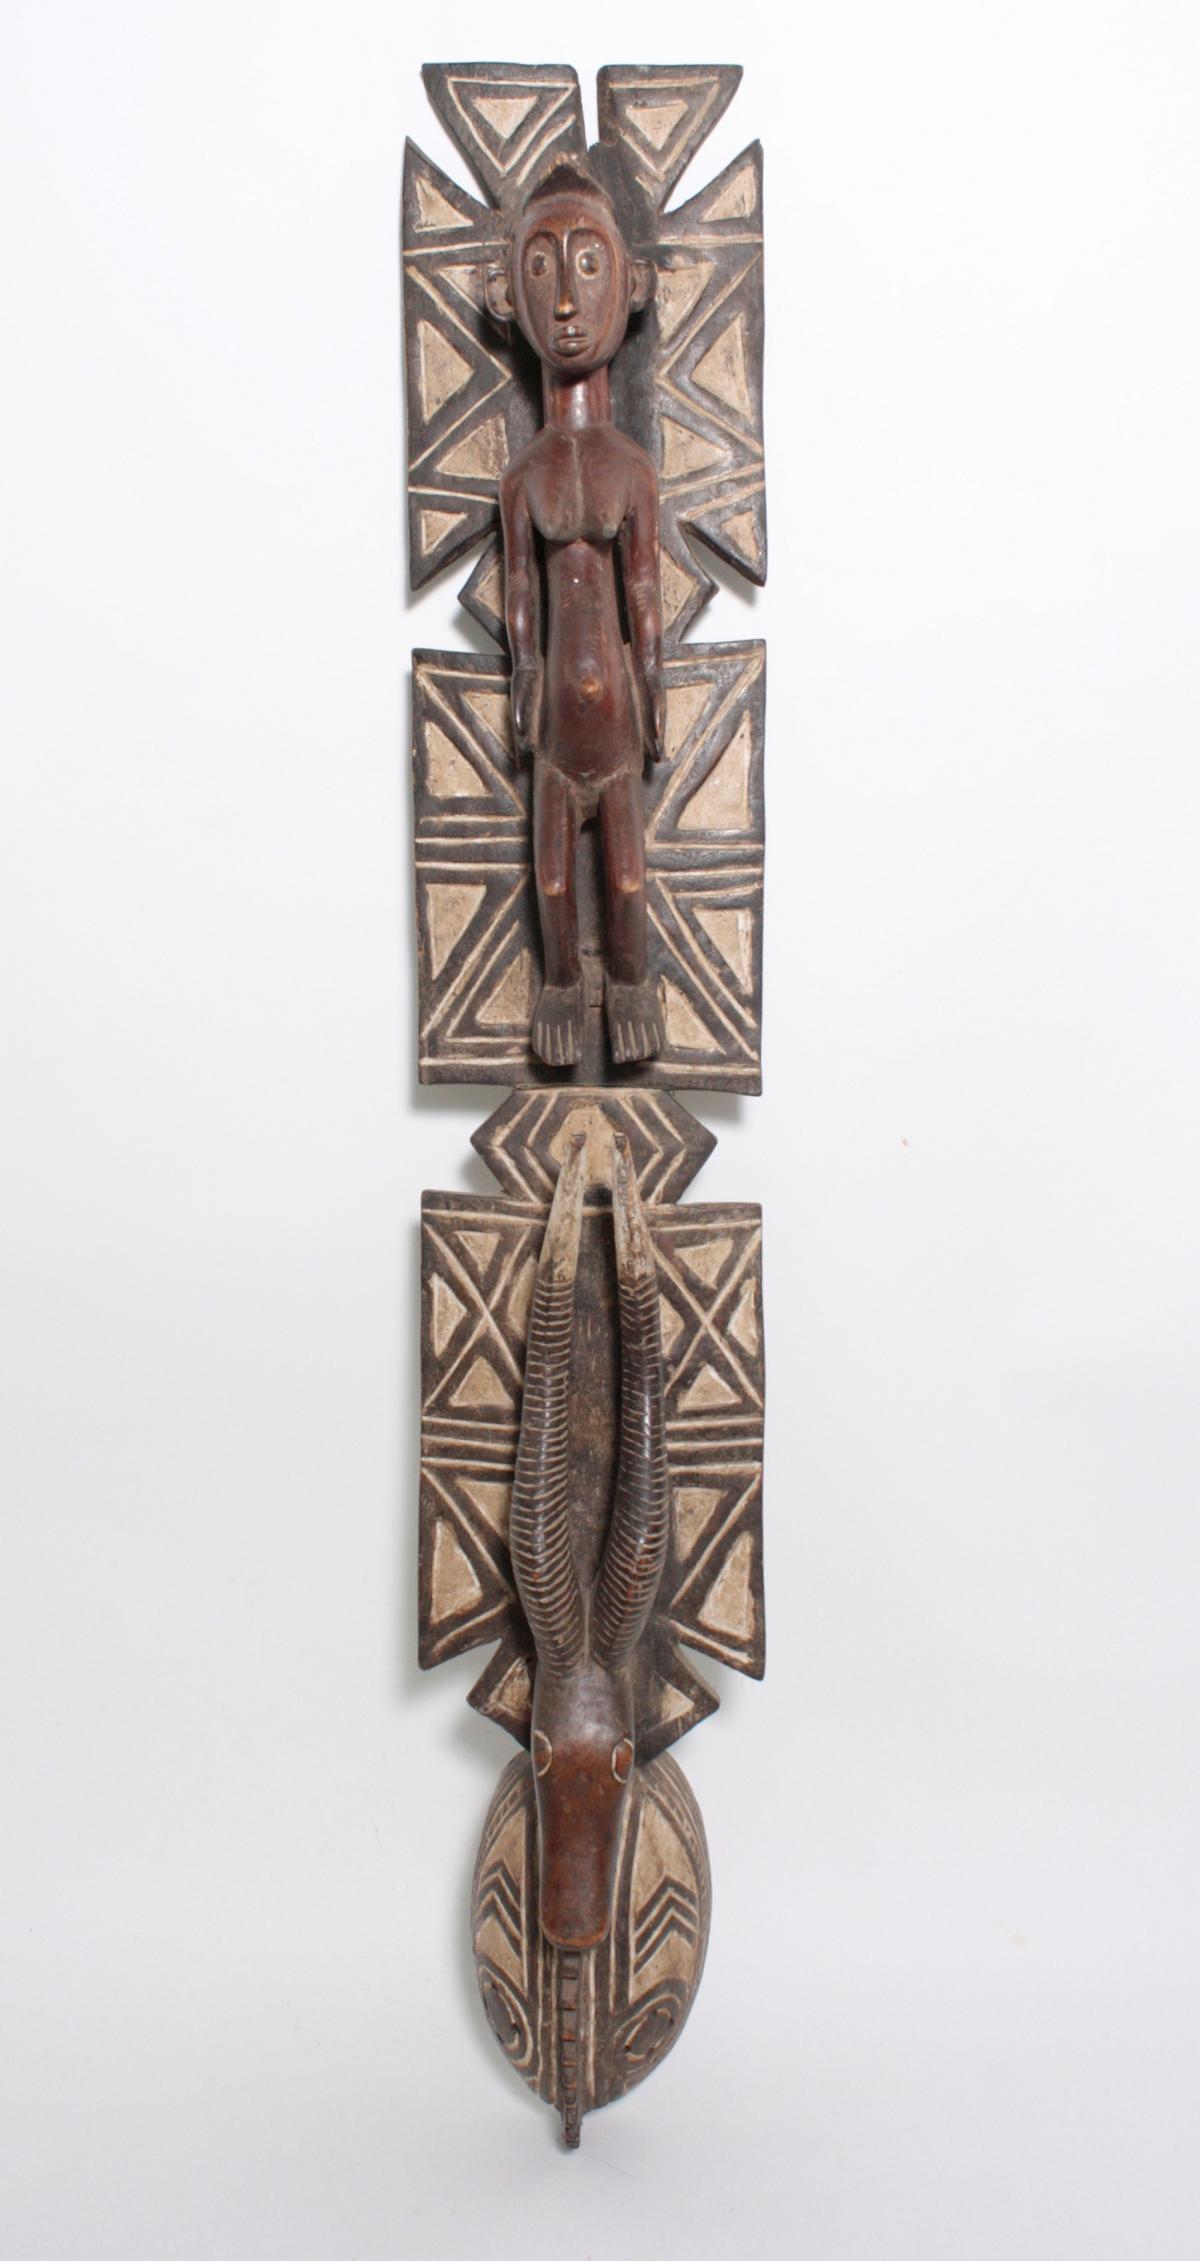 Aufsatz-Tanzmaske, Mossi, Burkina Faso, 1. Hälfte 20. Jh.